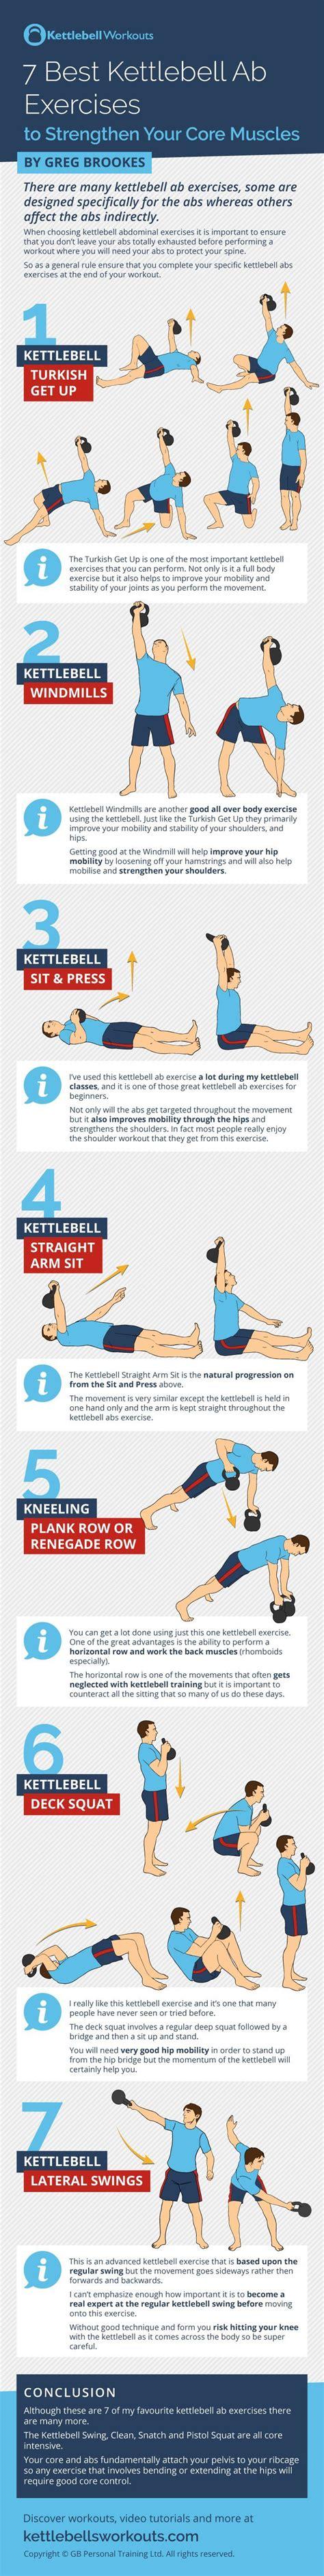 kettlebell abs exercises ab workout workouts bonkers kettlebellsworkouts